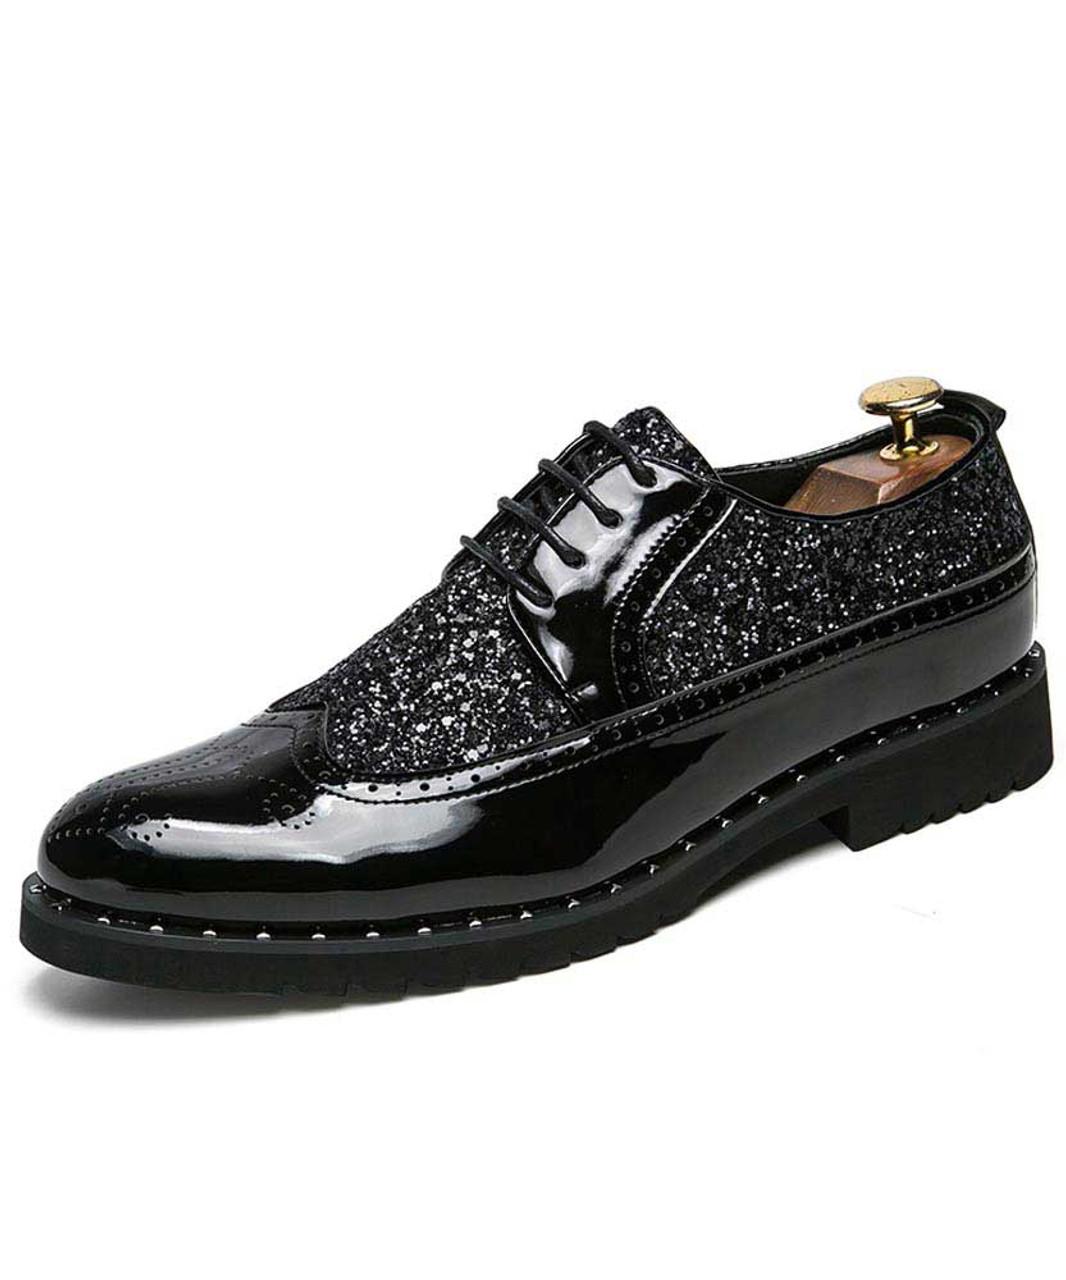 mens black spiked dress shoes